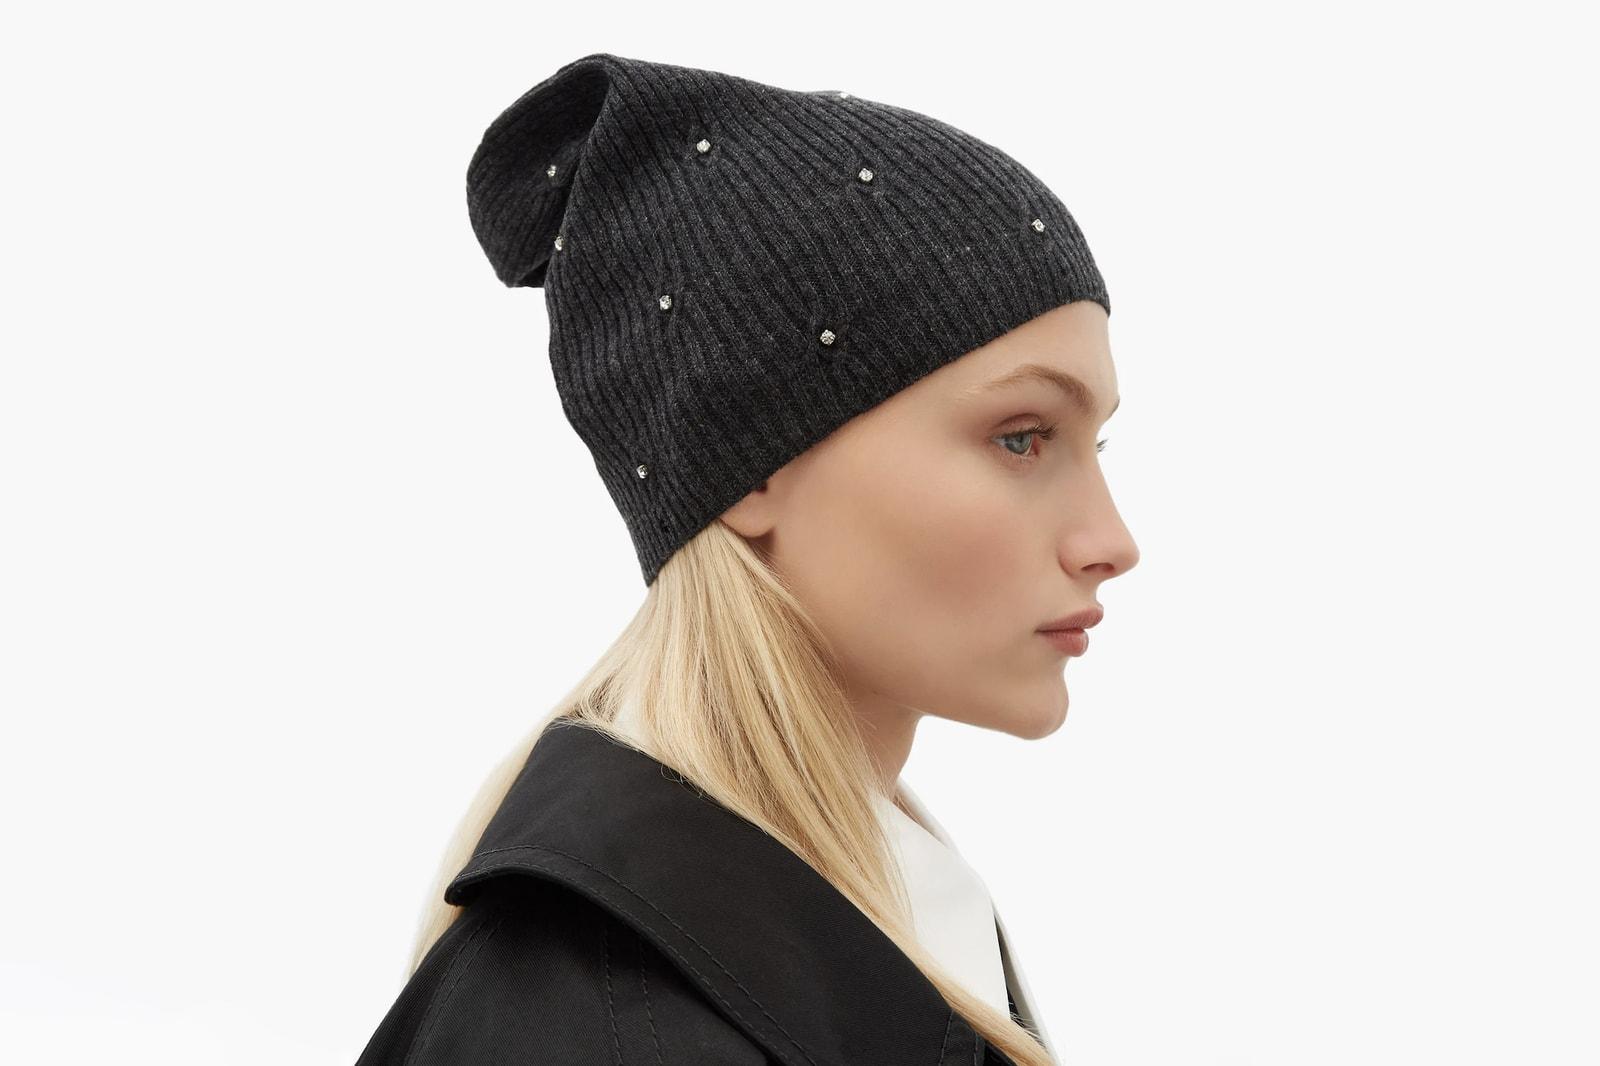 Designer Beanie Hat Fall Winter Gucci Balenciaga Fendi Givenchy Acne Studios Accessory